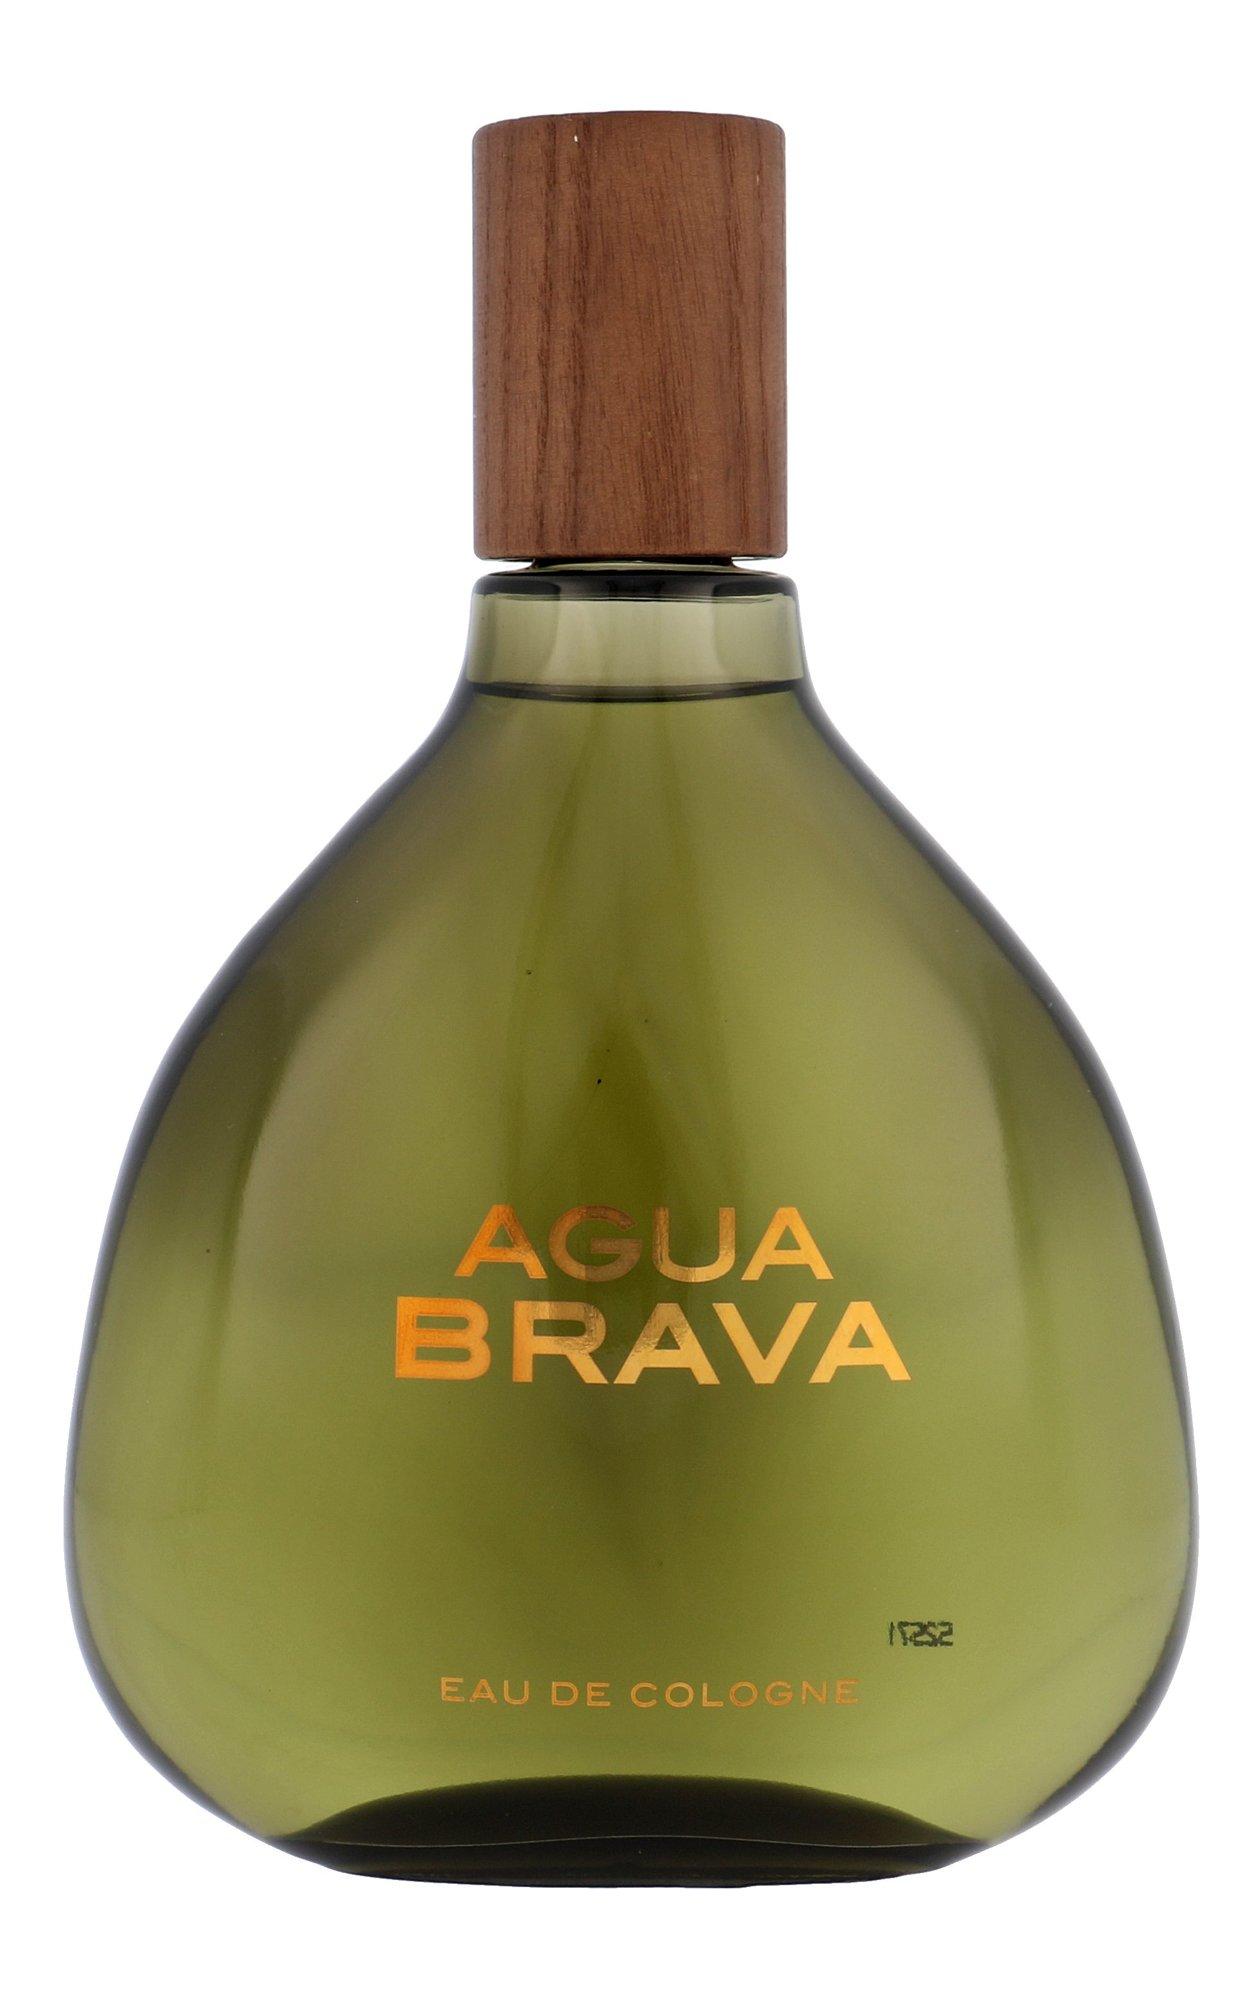 Antonio Puig Agua Brava Cologne 350ml